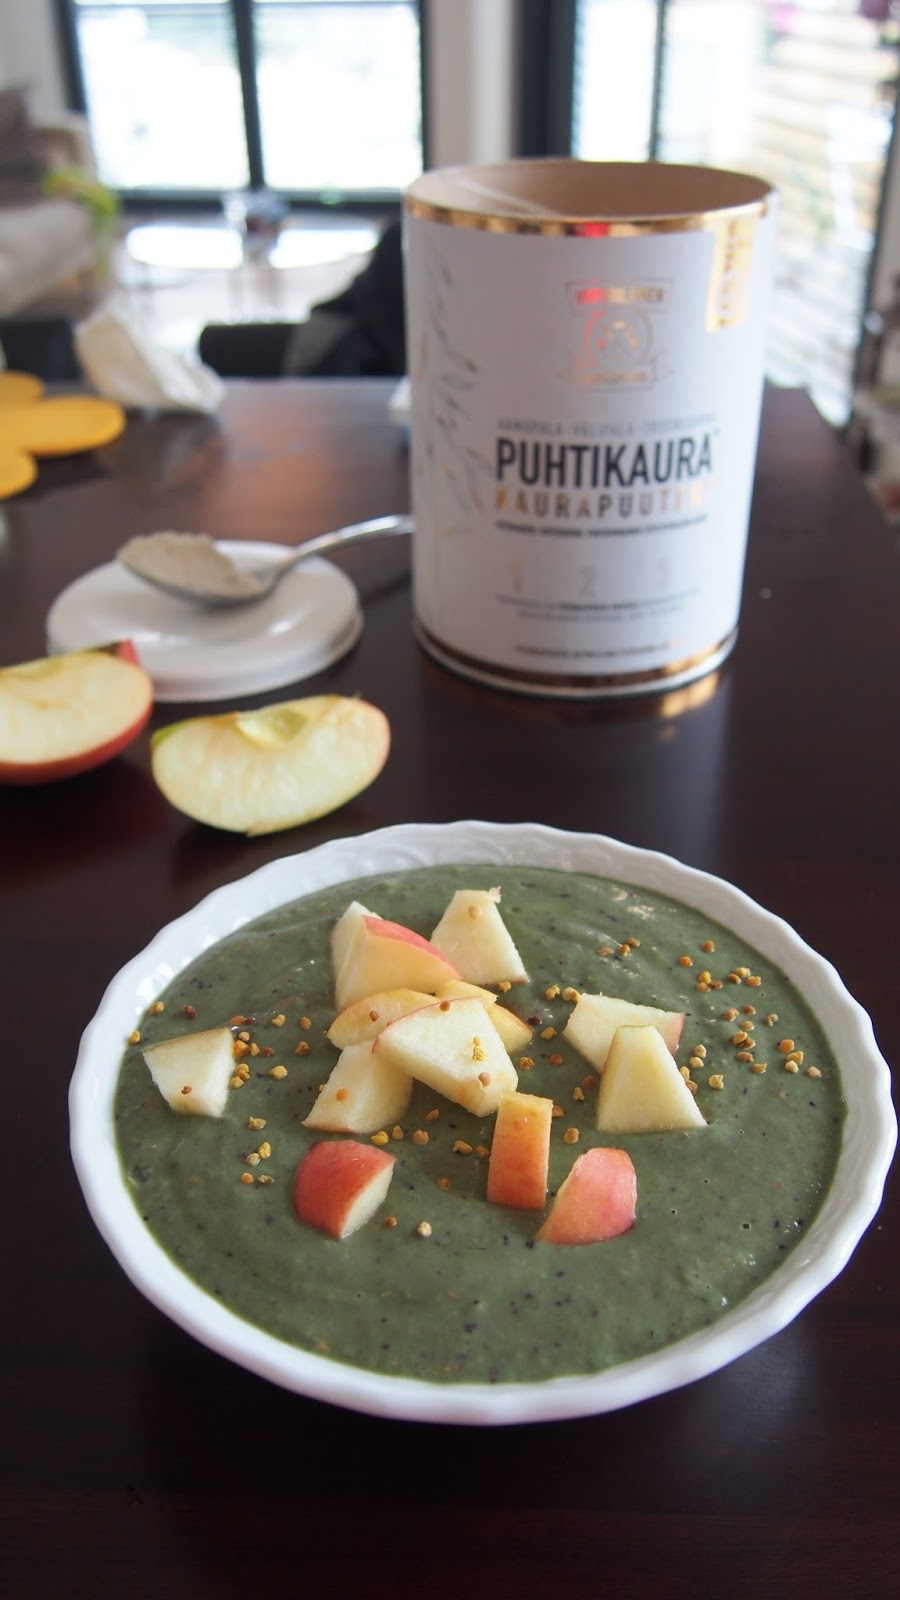 Reseptit: Puhtikaura smoothiebowl